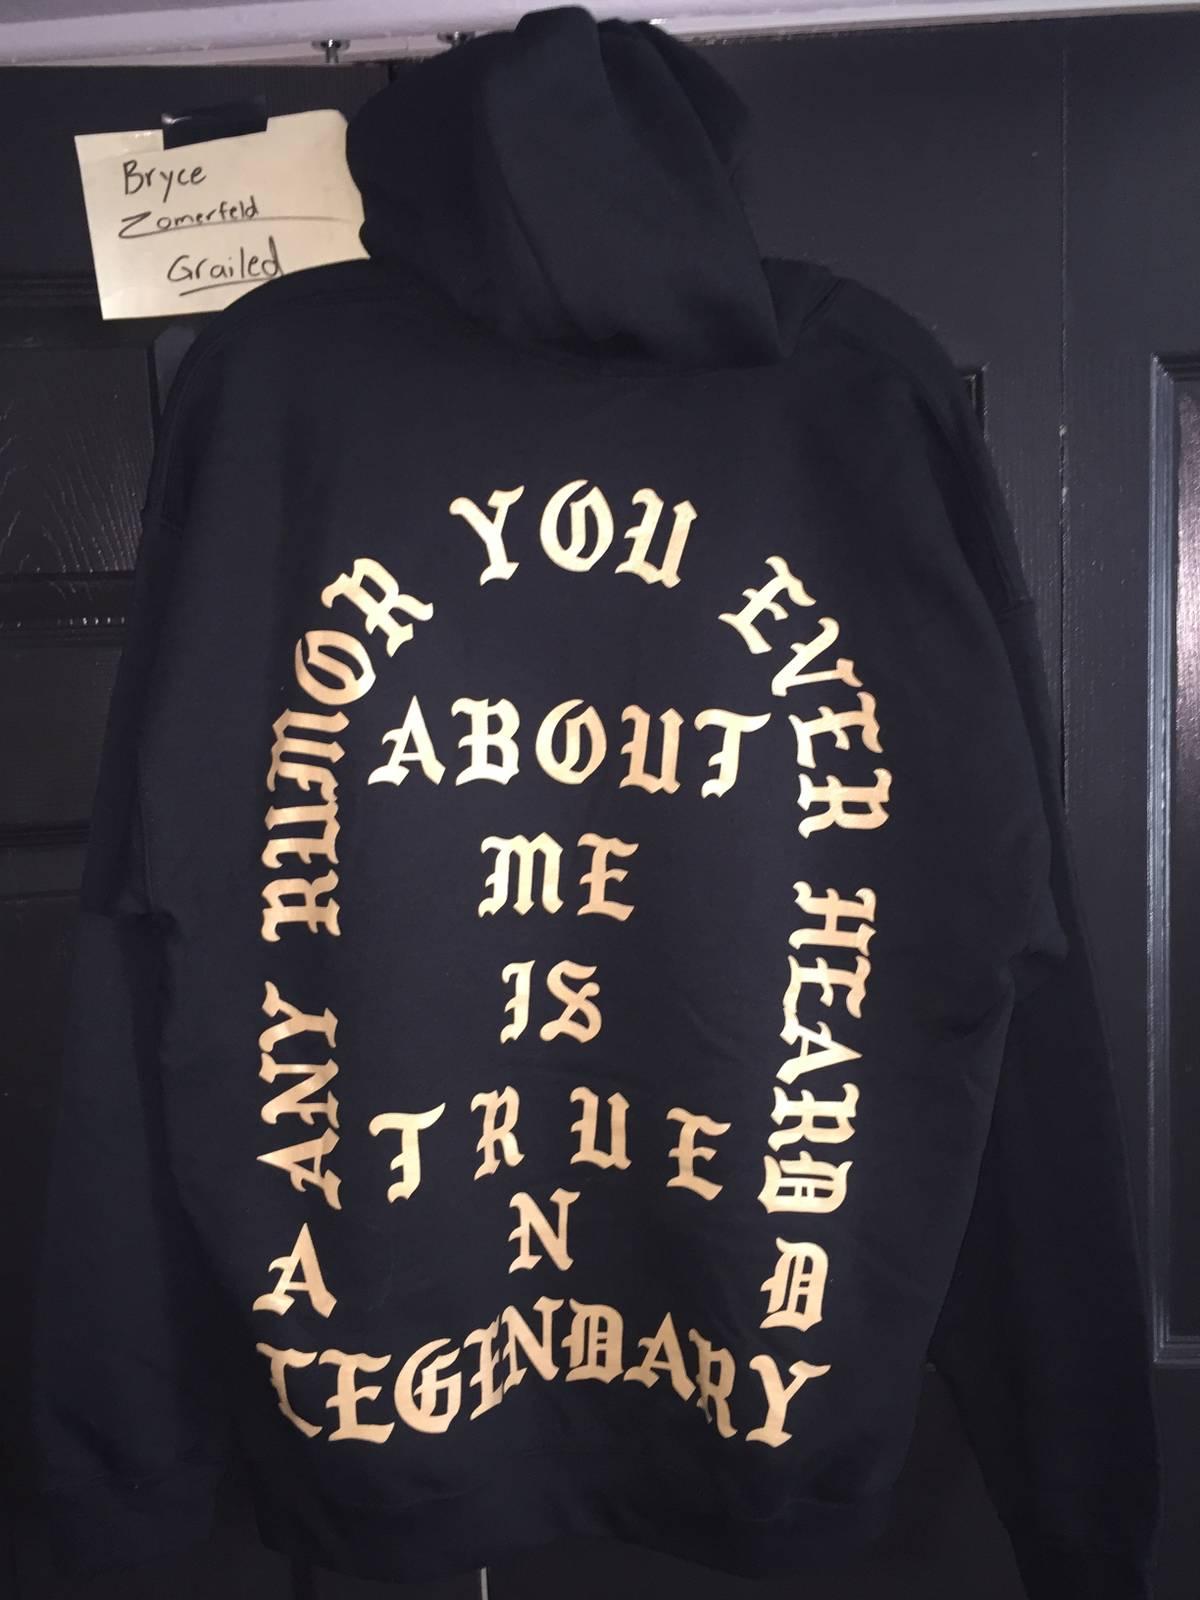 Kanye Pablo Miami Pop Up Perfect Black Crew Neck Sweatshirt Sweater S Small